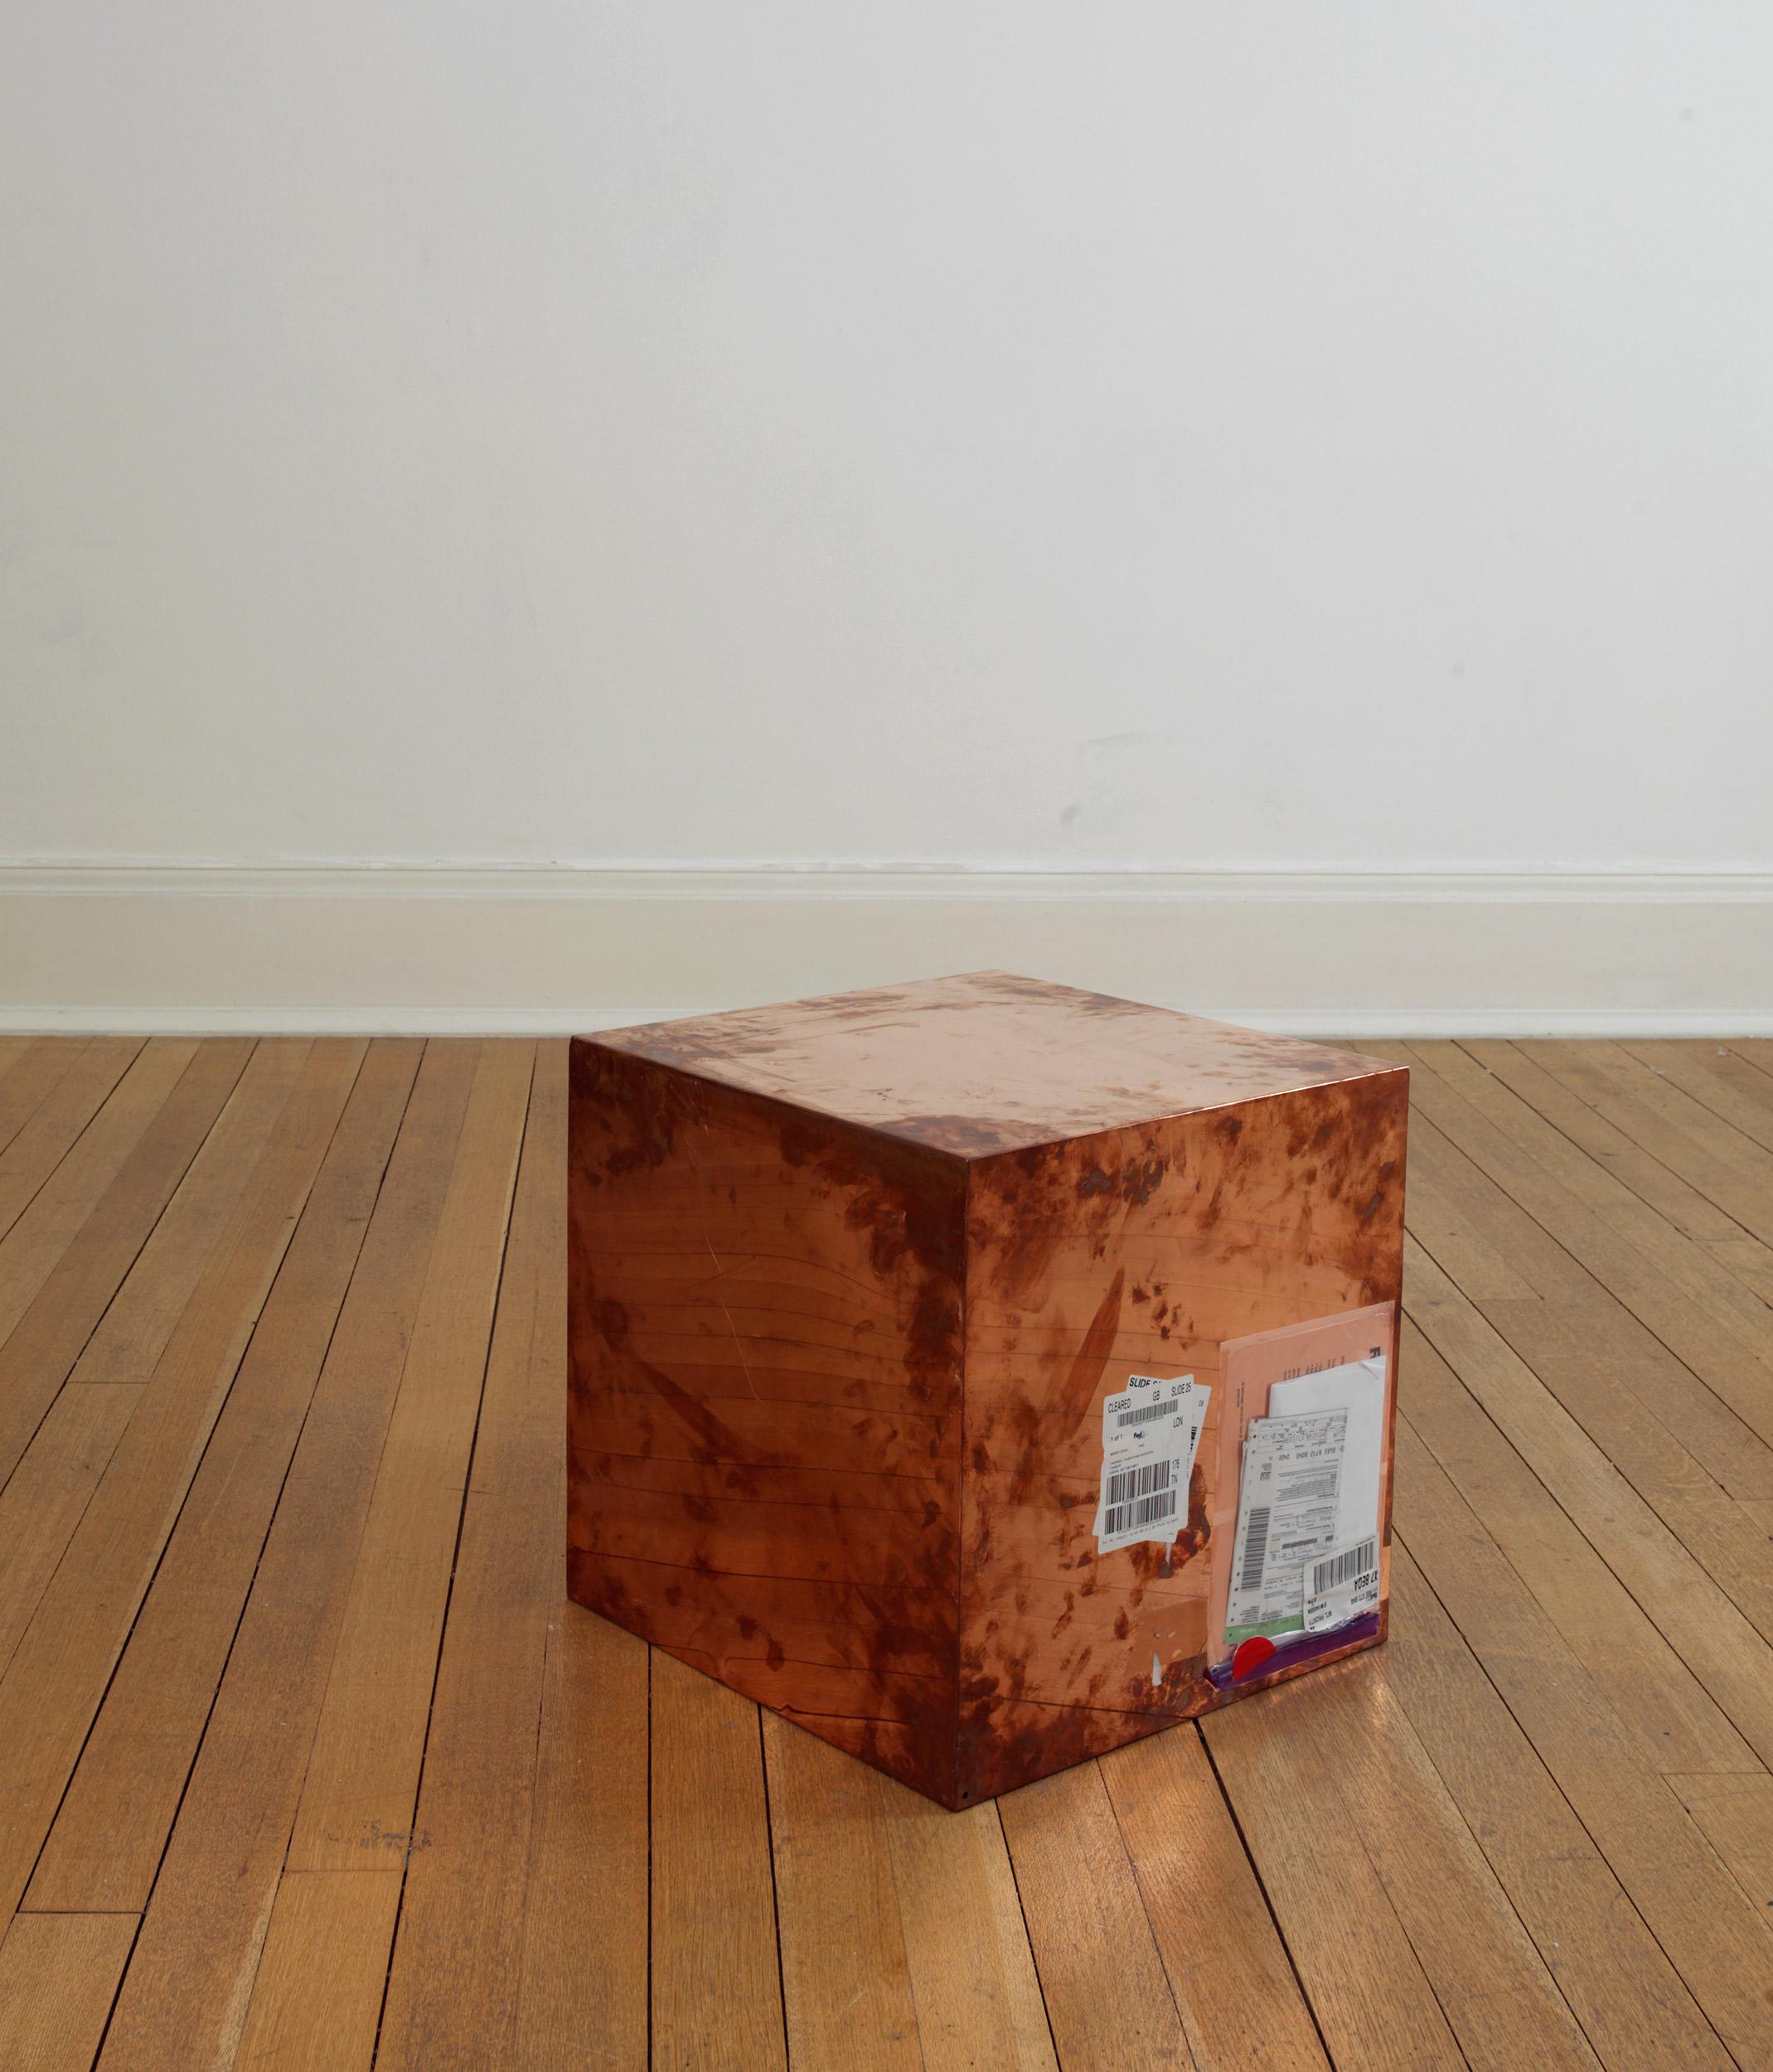 FedEx® Large Kraft Box  © 2005 FEDEX 330508 REV 10/05 SSCC, International Priority, Los Angeles–London trk#868587728040, October 02–05, 2009, International Priority, London–New York trk#863822956489, November 18–20, 2009, International Priority, New York–London trk#795200981790, September 19–21, 2011    2009–   Polished copper, accrued FedEx shipping and tracking labels  20 x 20 x 20 inches   FedEx Copper Works, 2009–